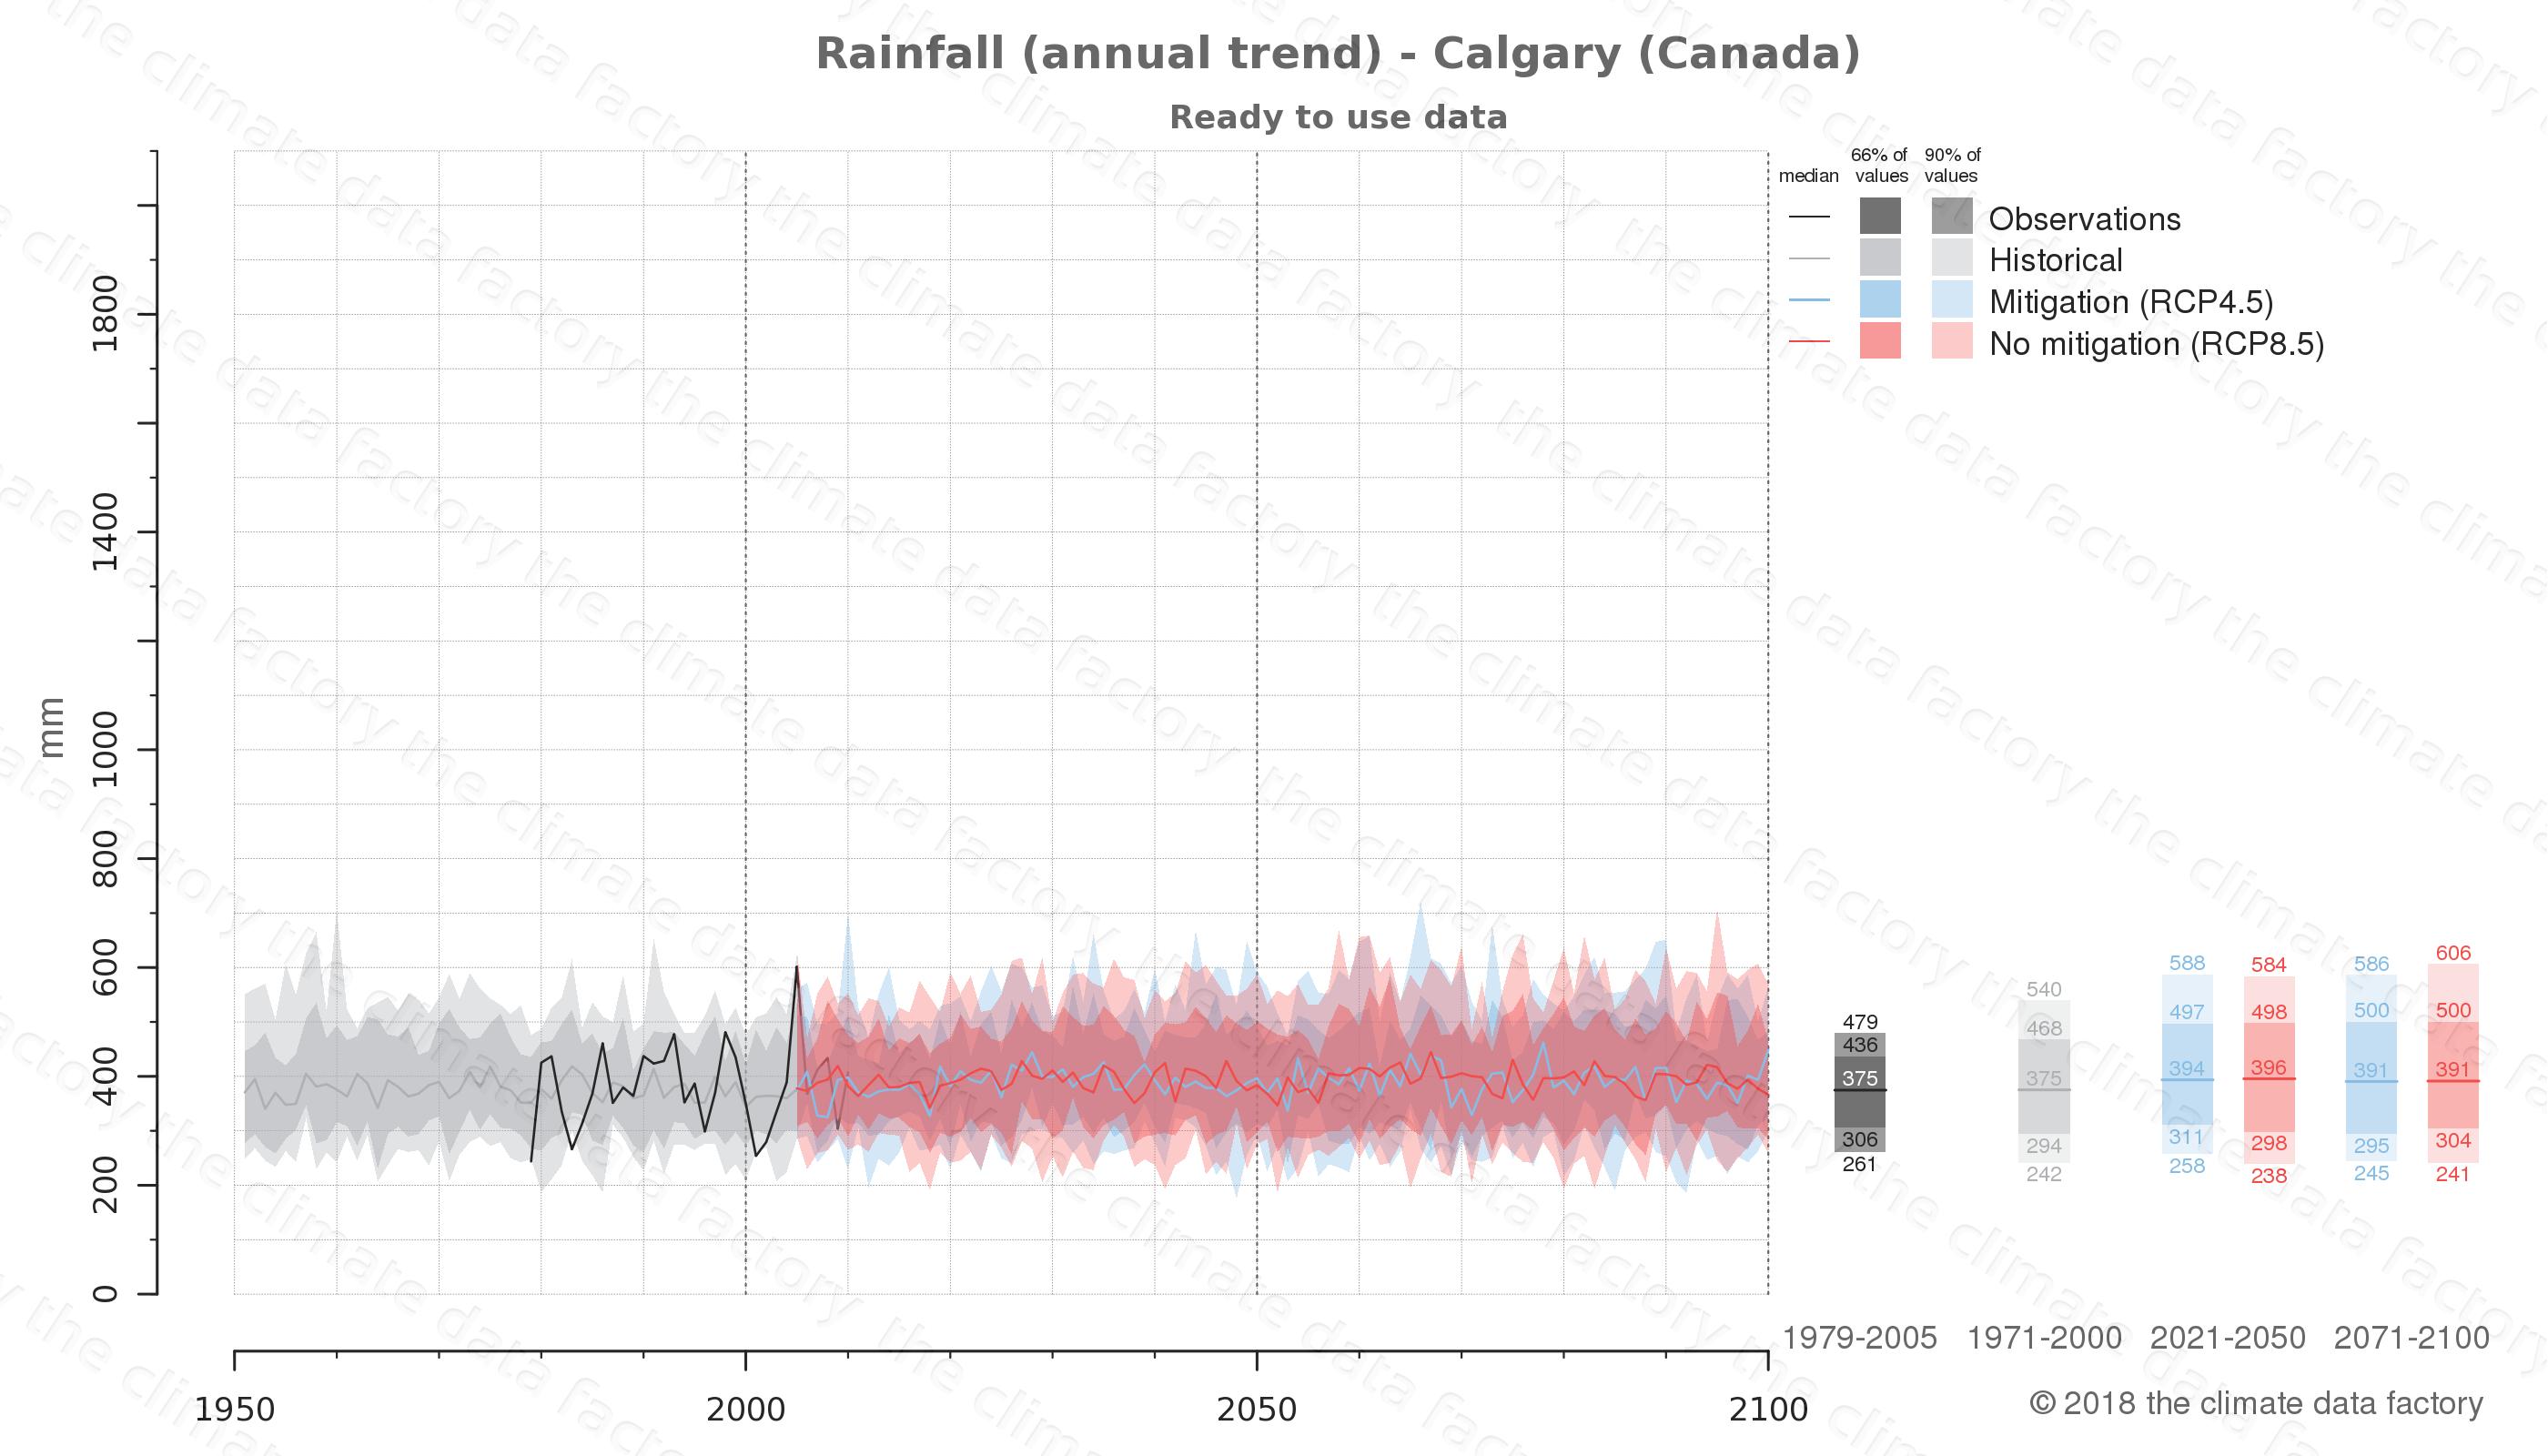 climate change data policy adaptation climate graph city data rainfall calgary canada